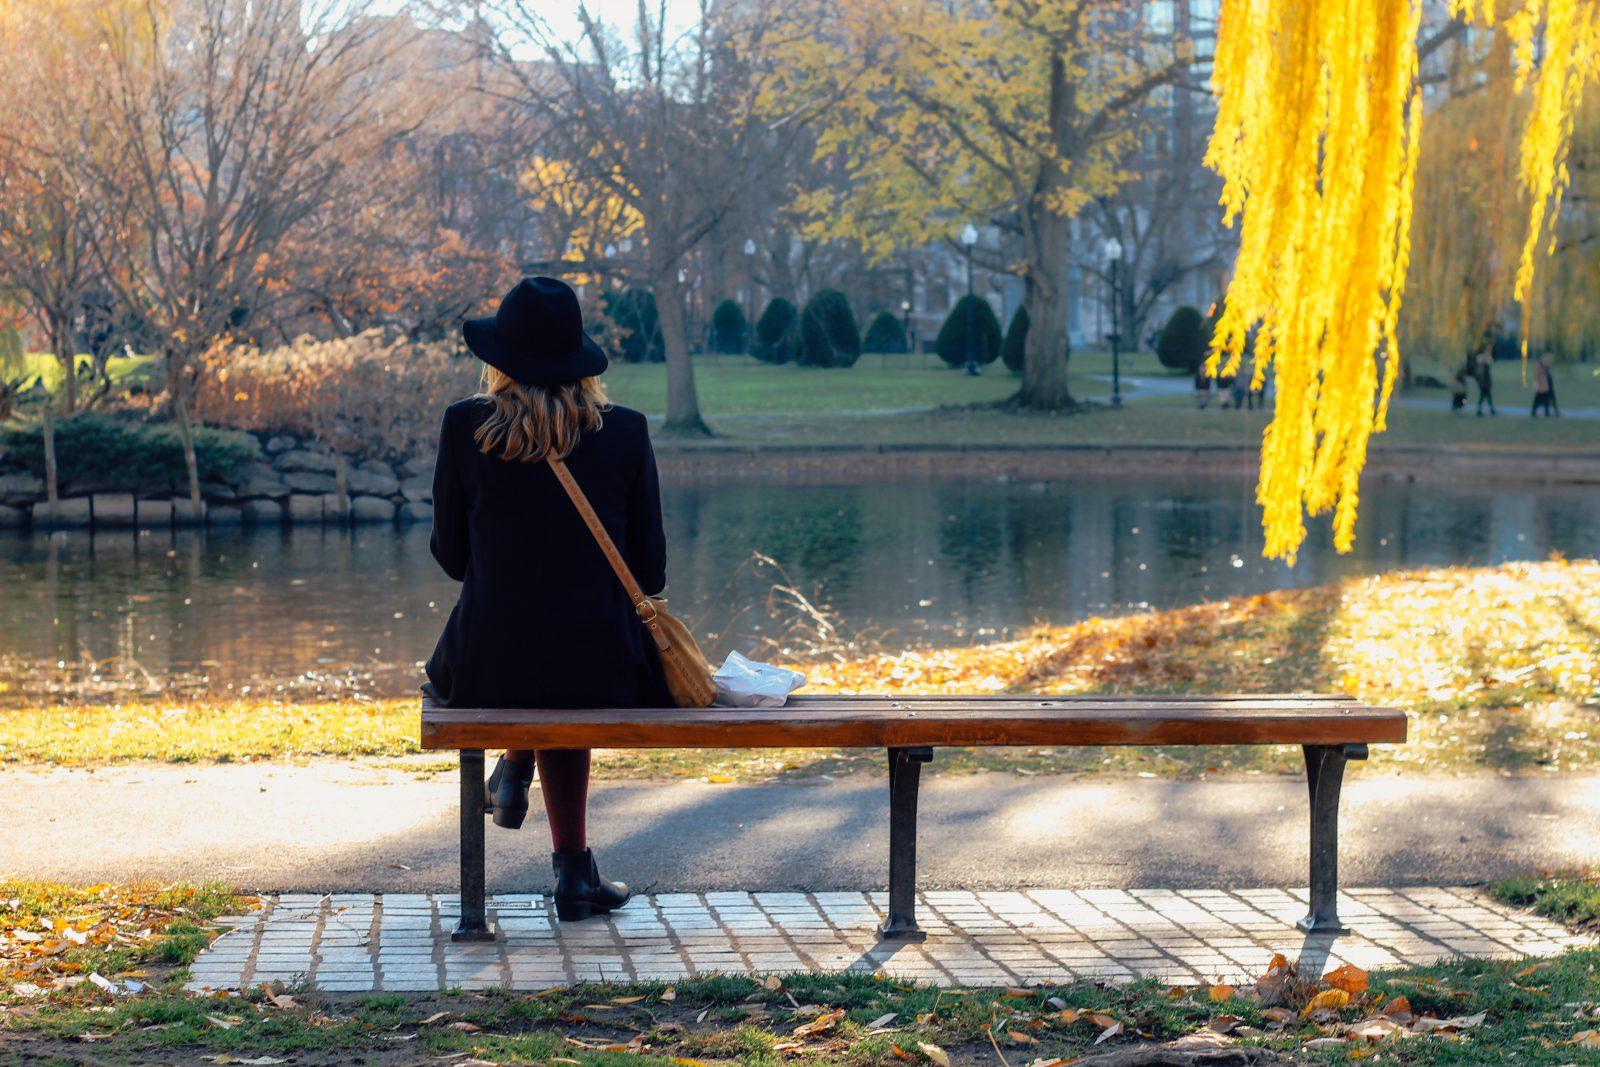 vrouw op bankje in park